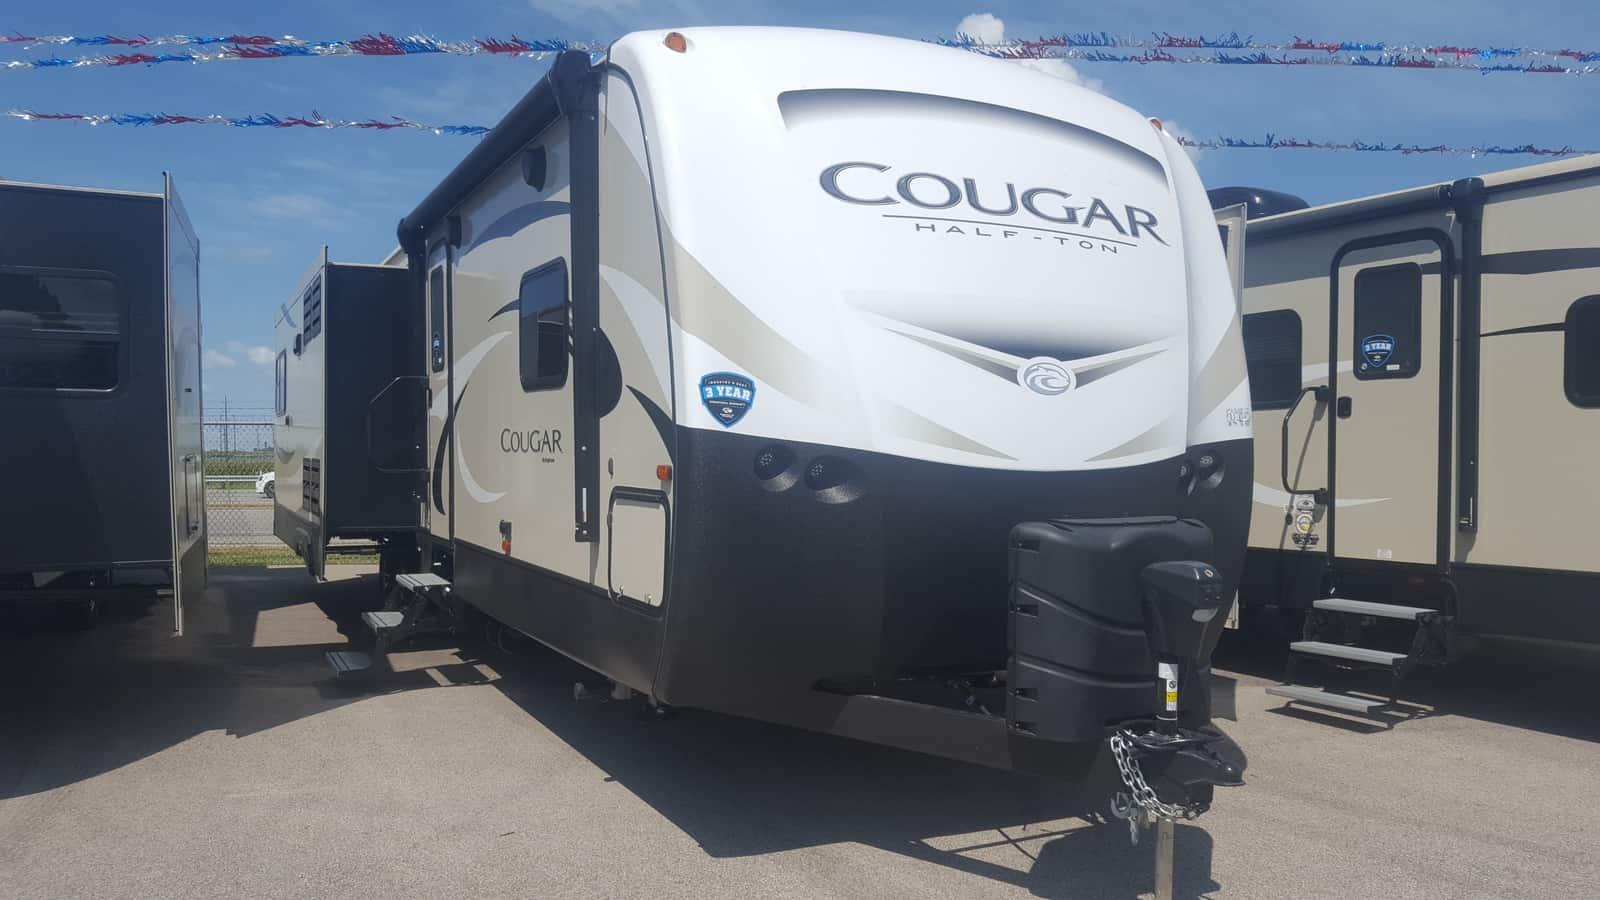 NEW 2019 Keystone COUGAR HALF-TON 33SAB - American RV